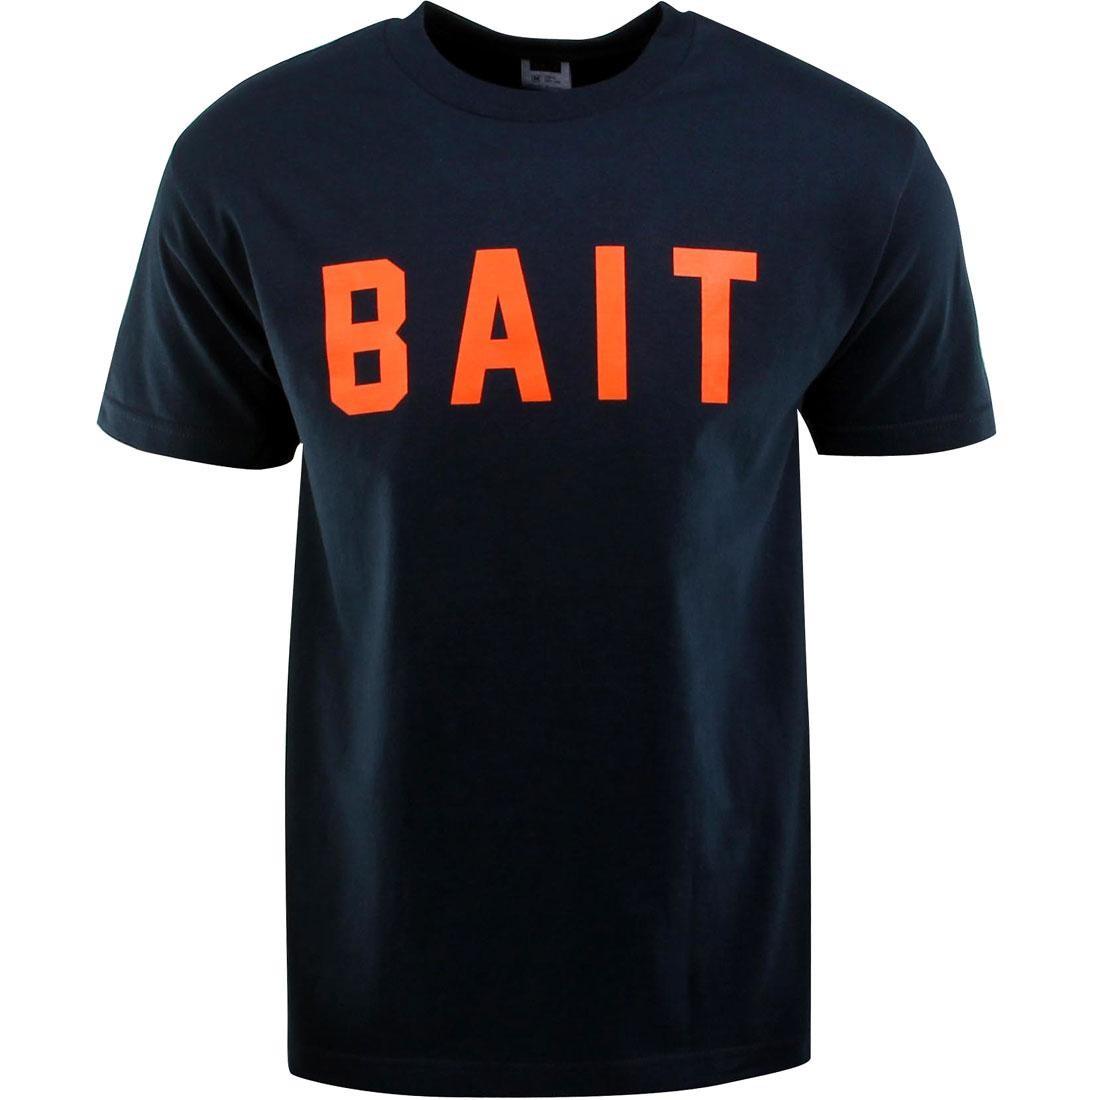 BAIT Logo Tee (navy / orange)